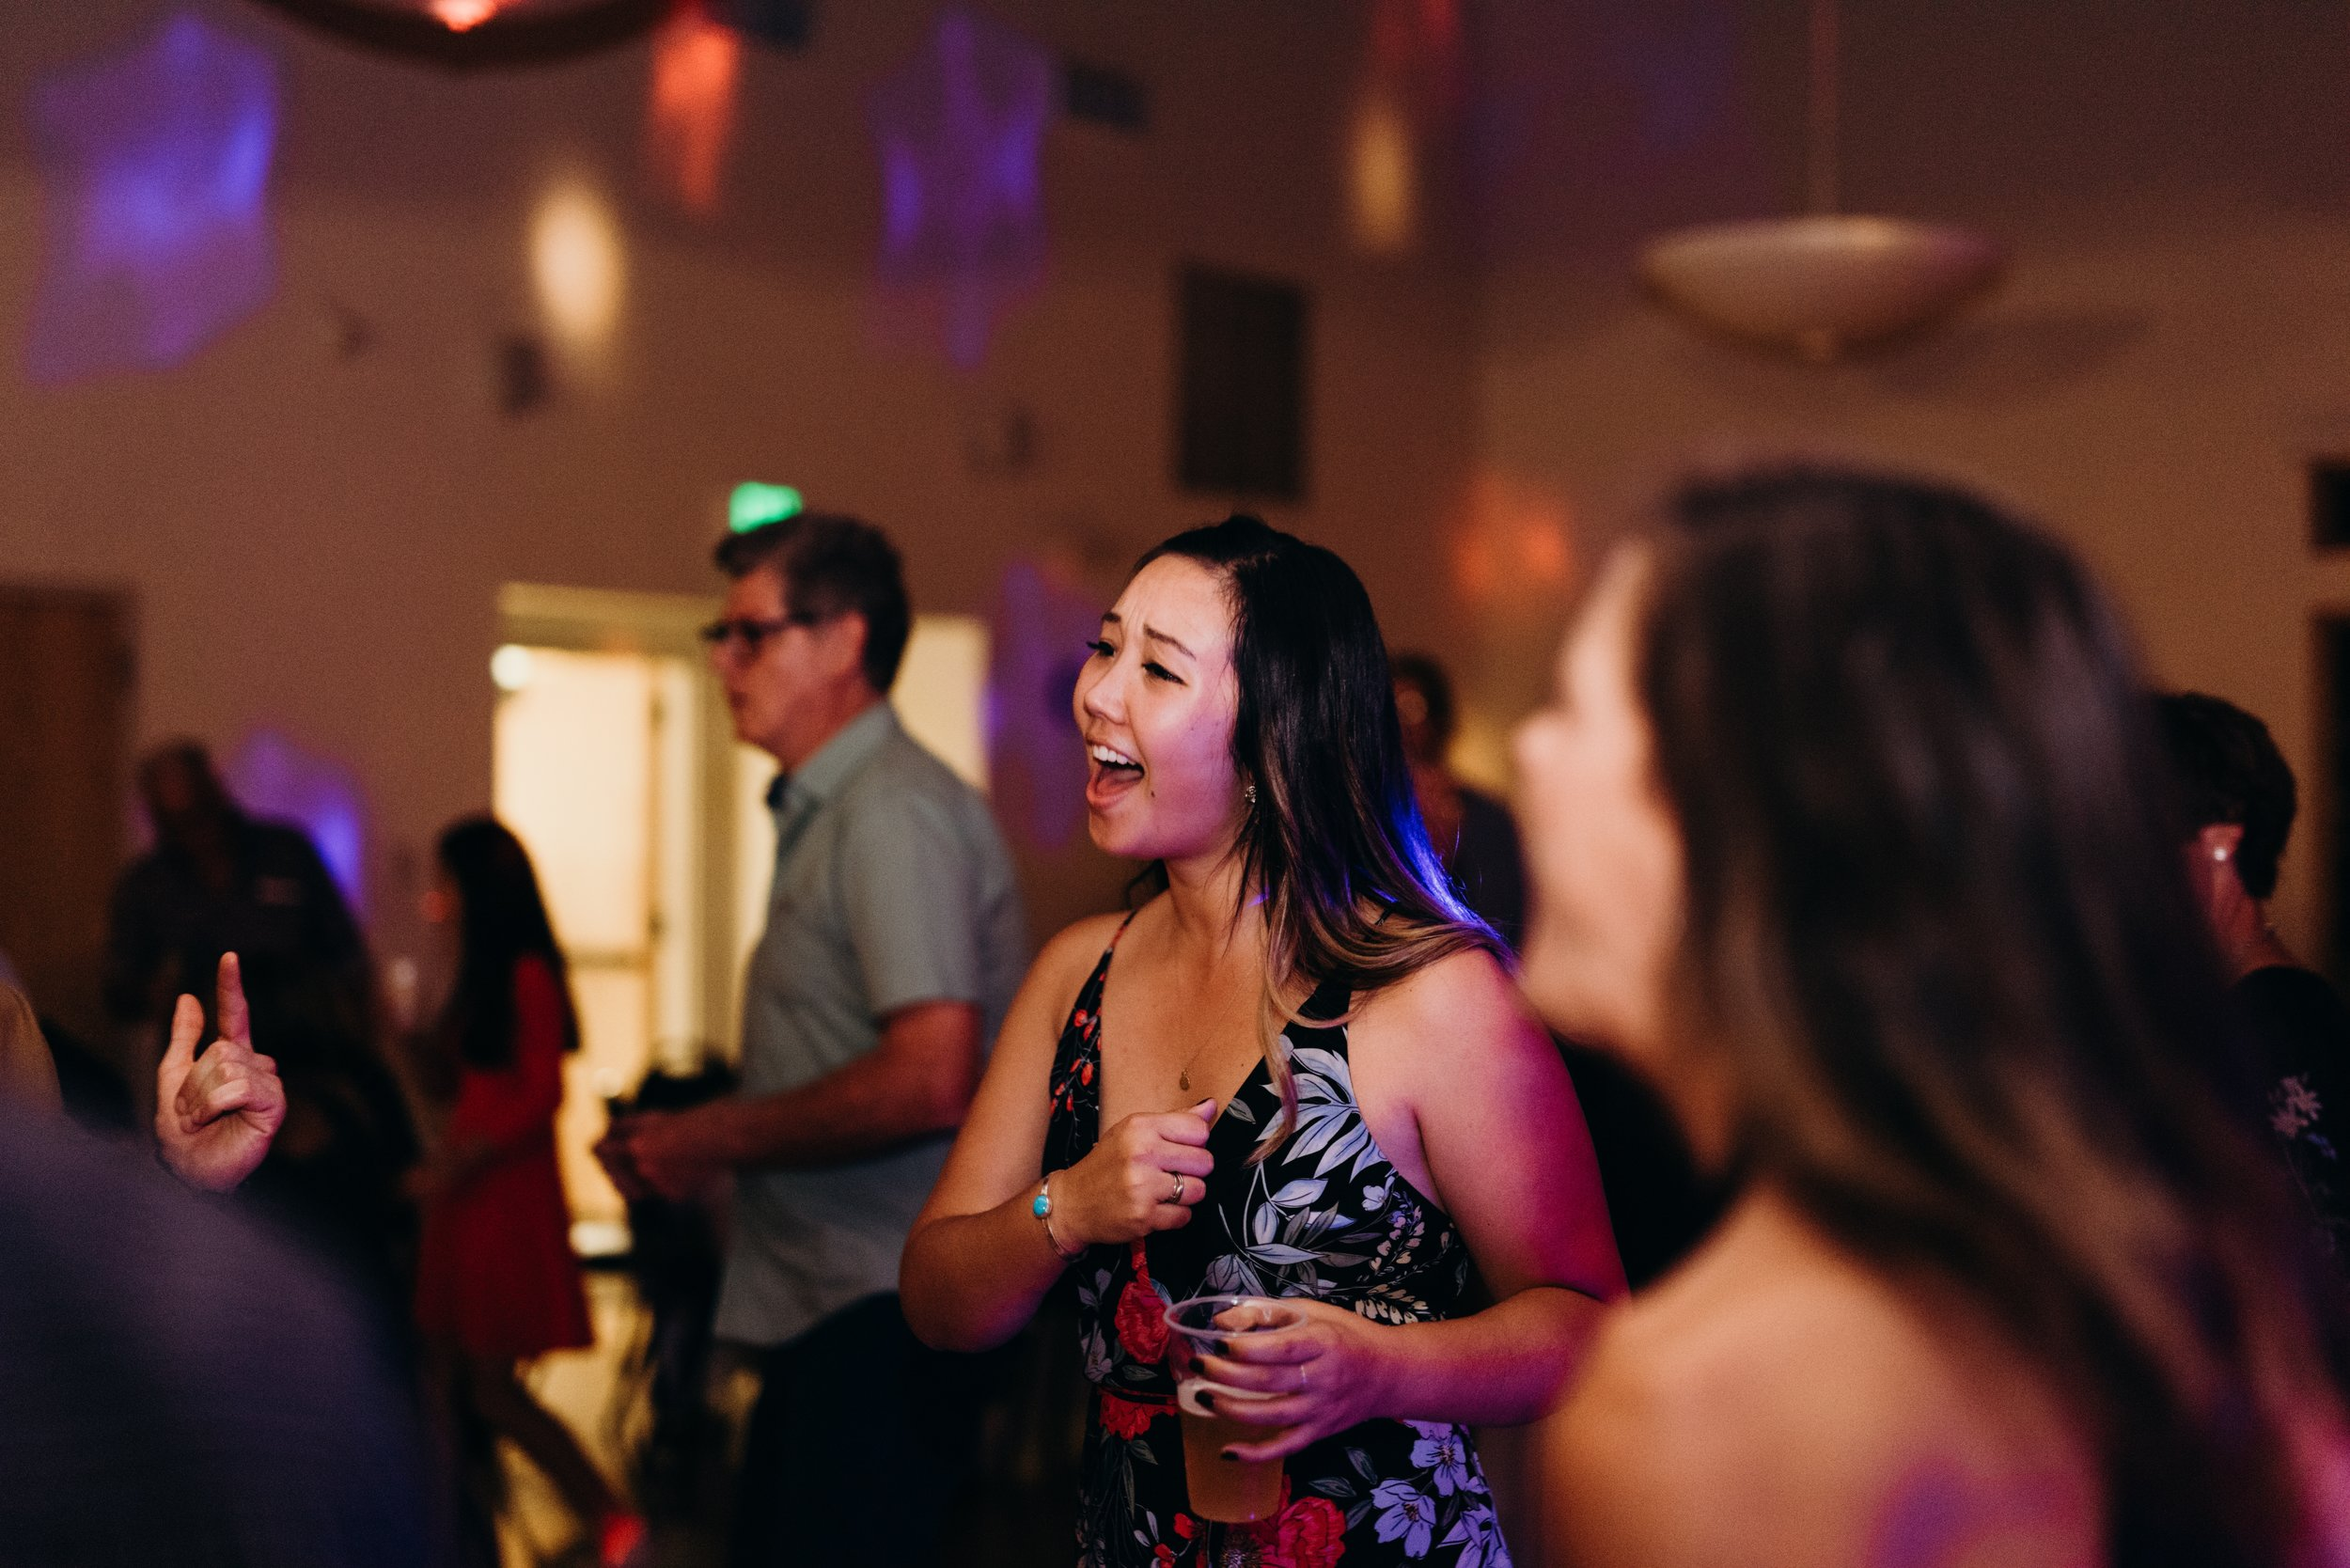 10 Dancing-25.jpeg